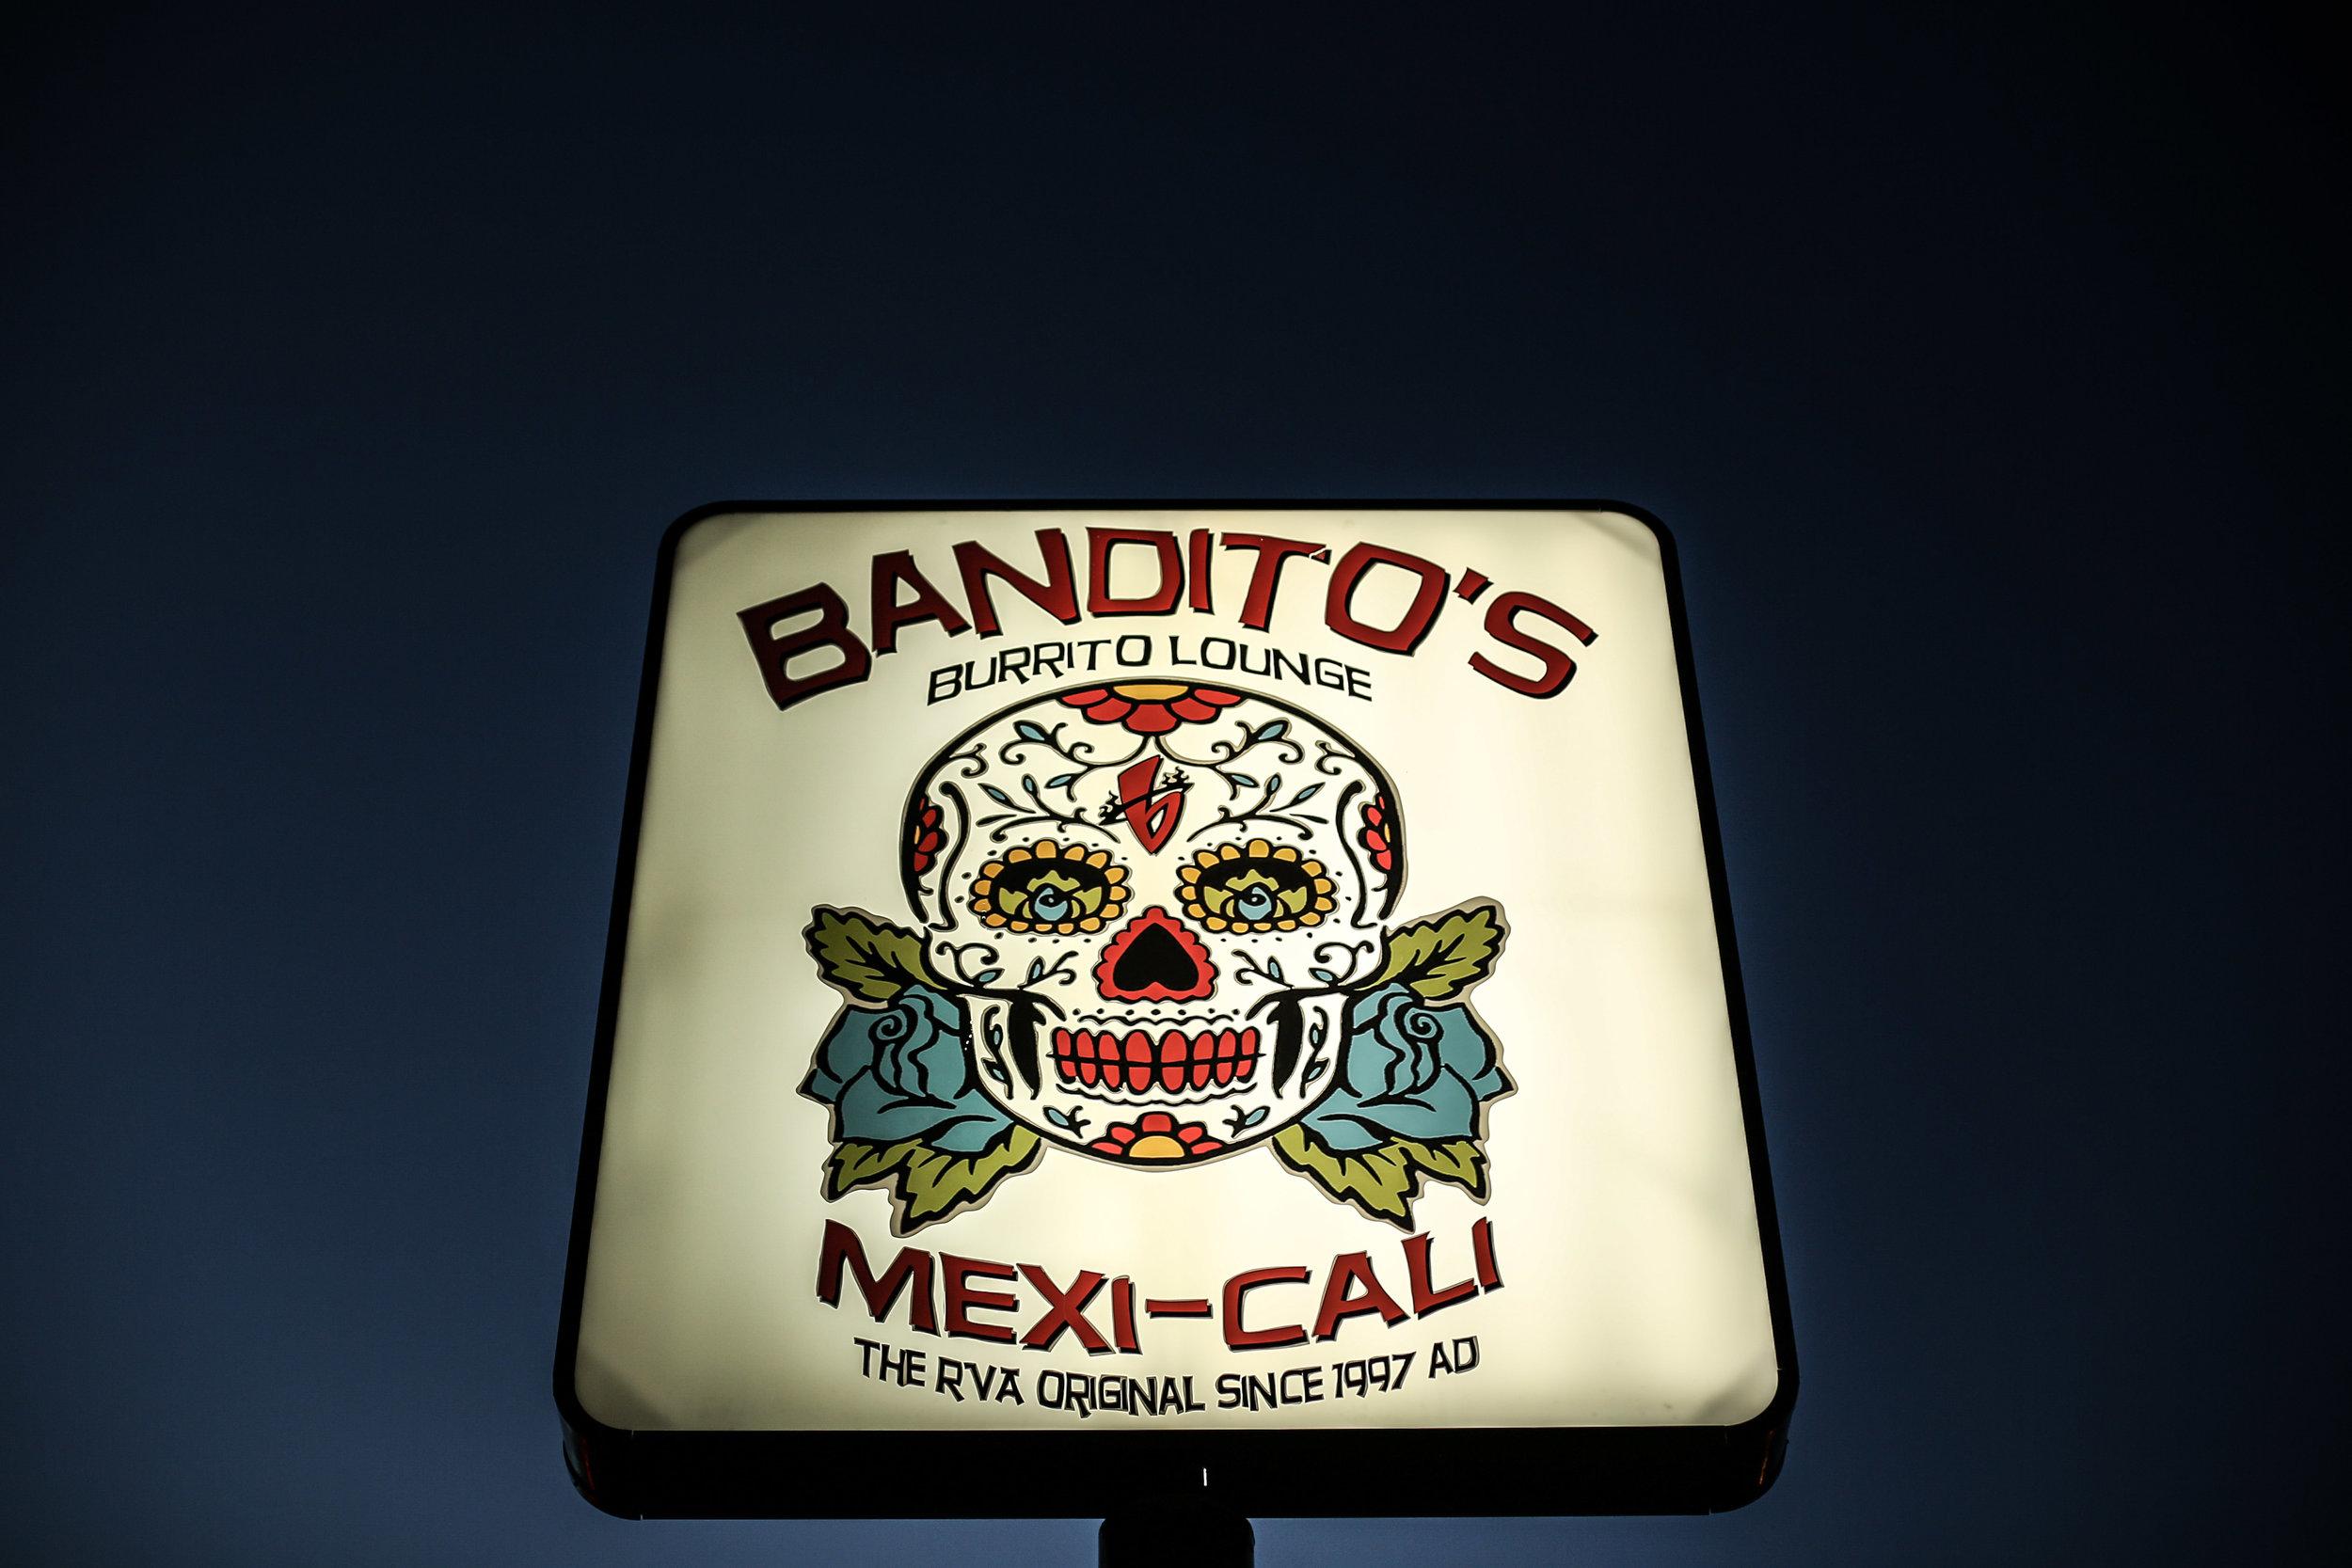 BANDITO_S 001.jpg